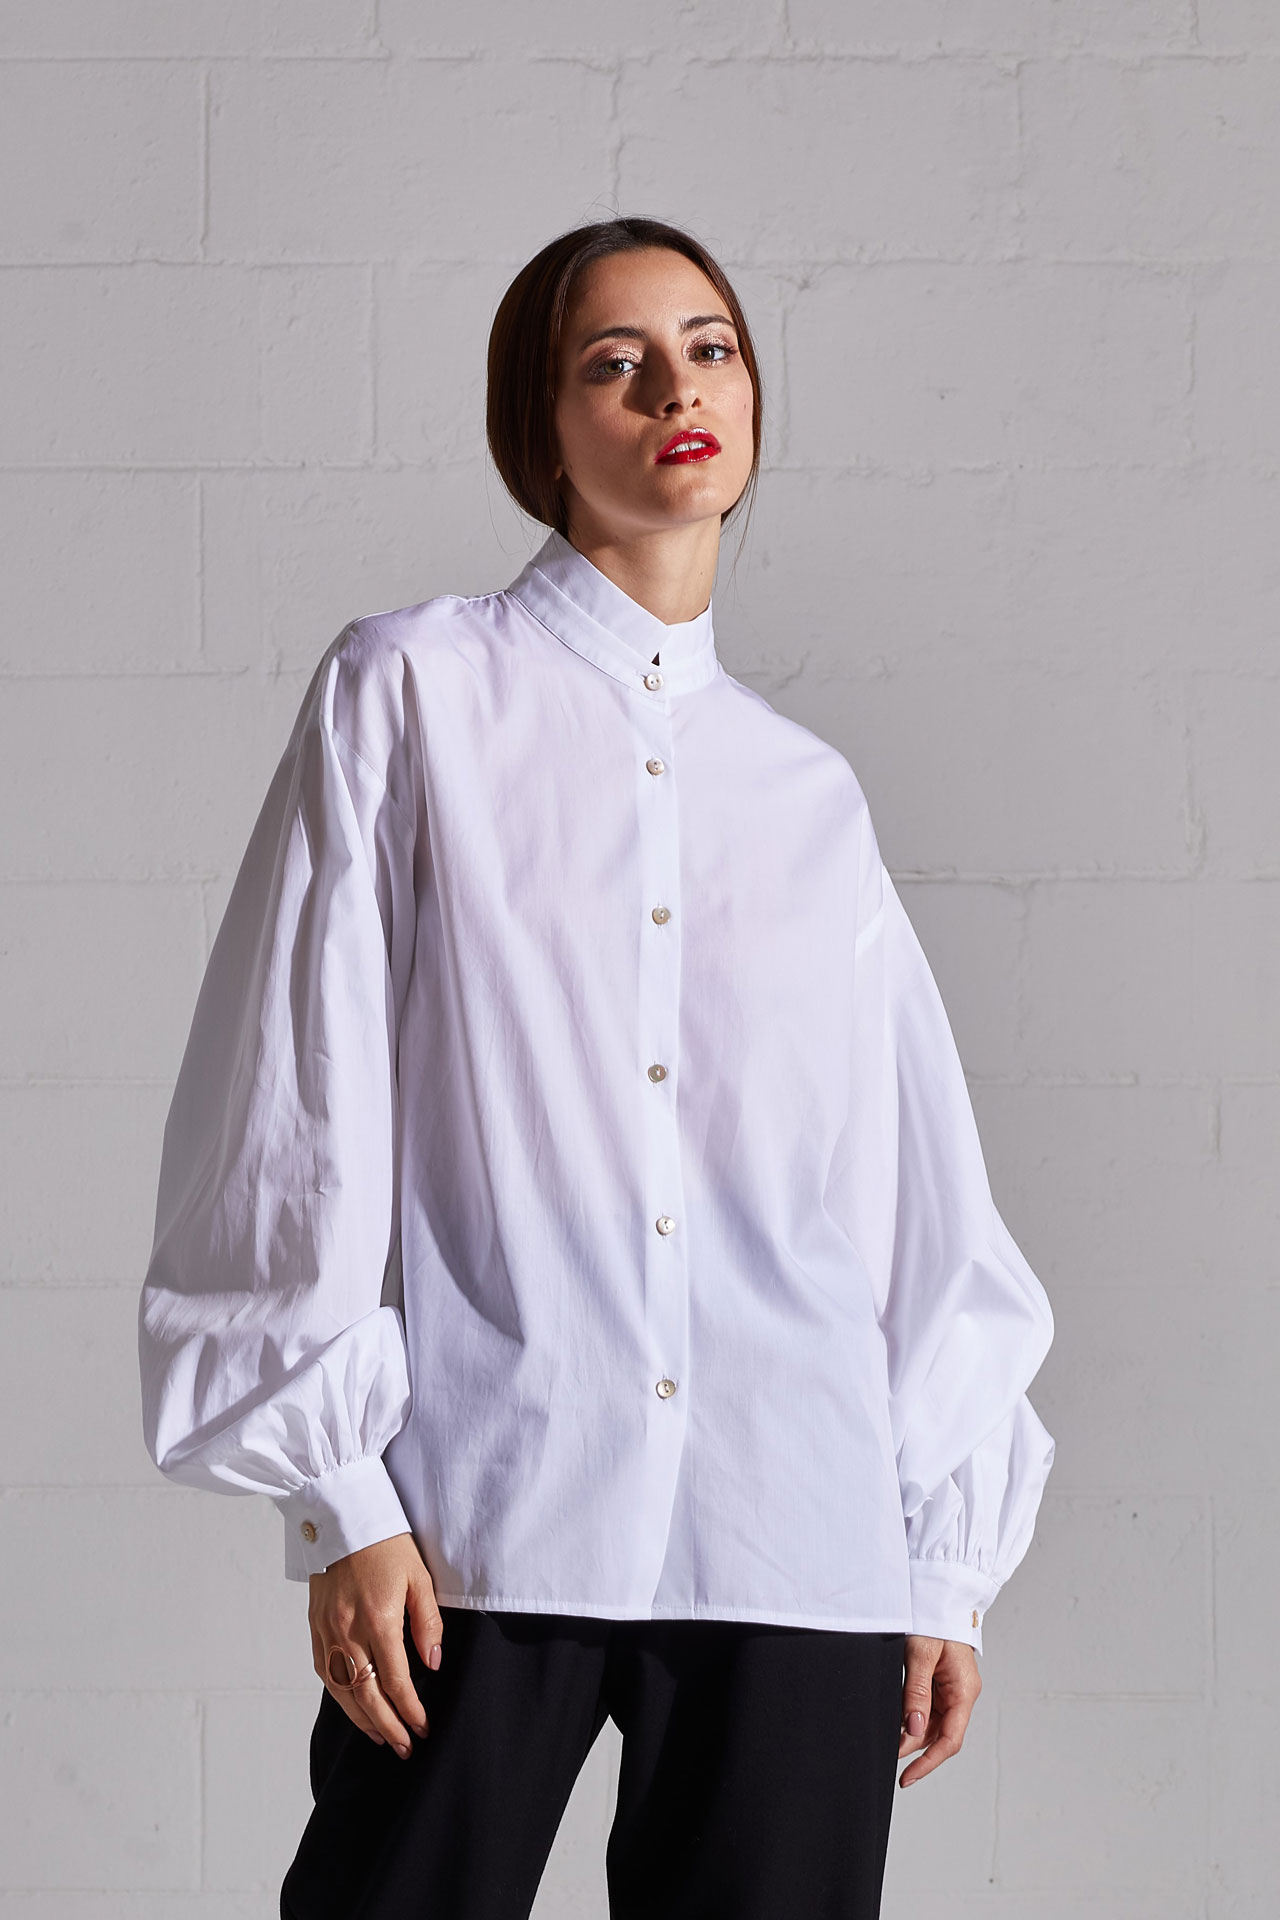 Organic Victorian blouse